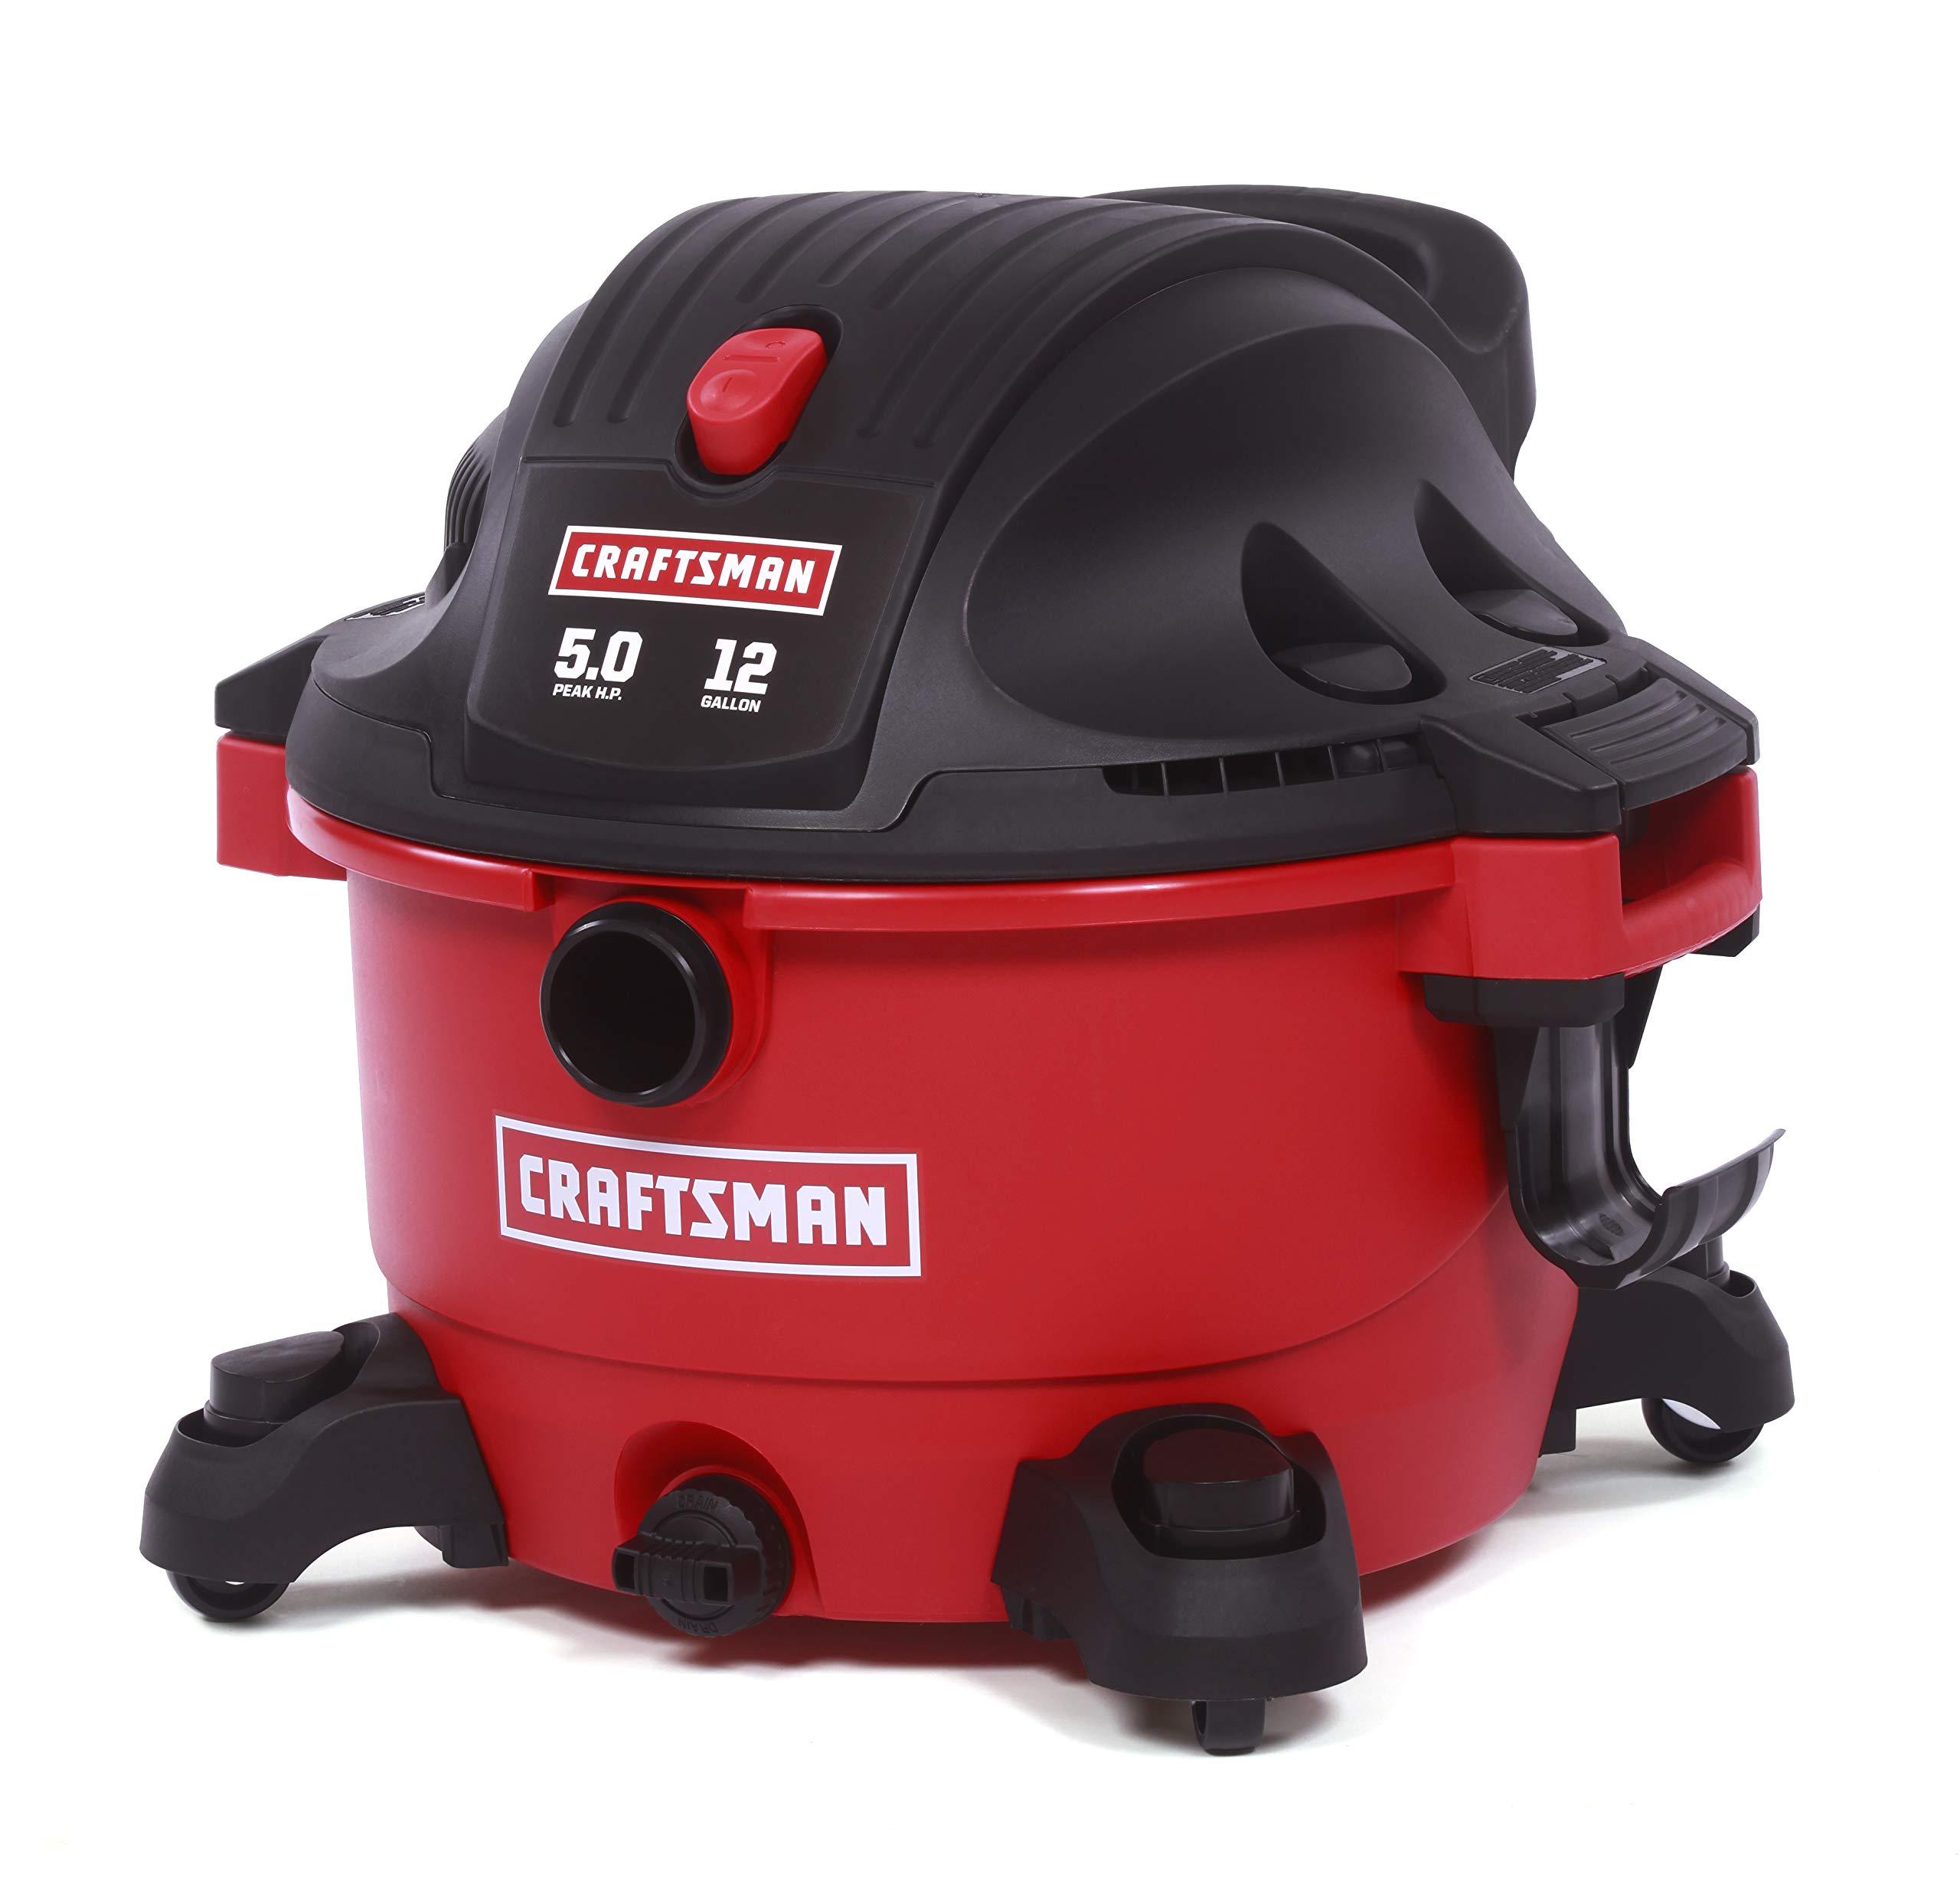 Craftsman 9-17765 12 Gallon 5.0 Peak Horsepower Wet and Dry Vacuum